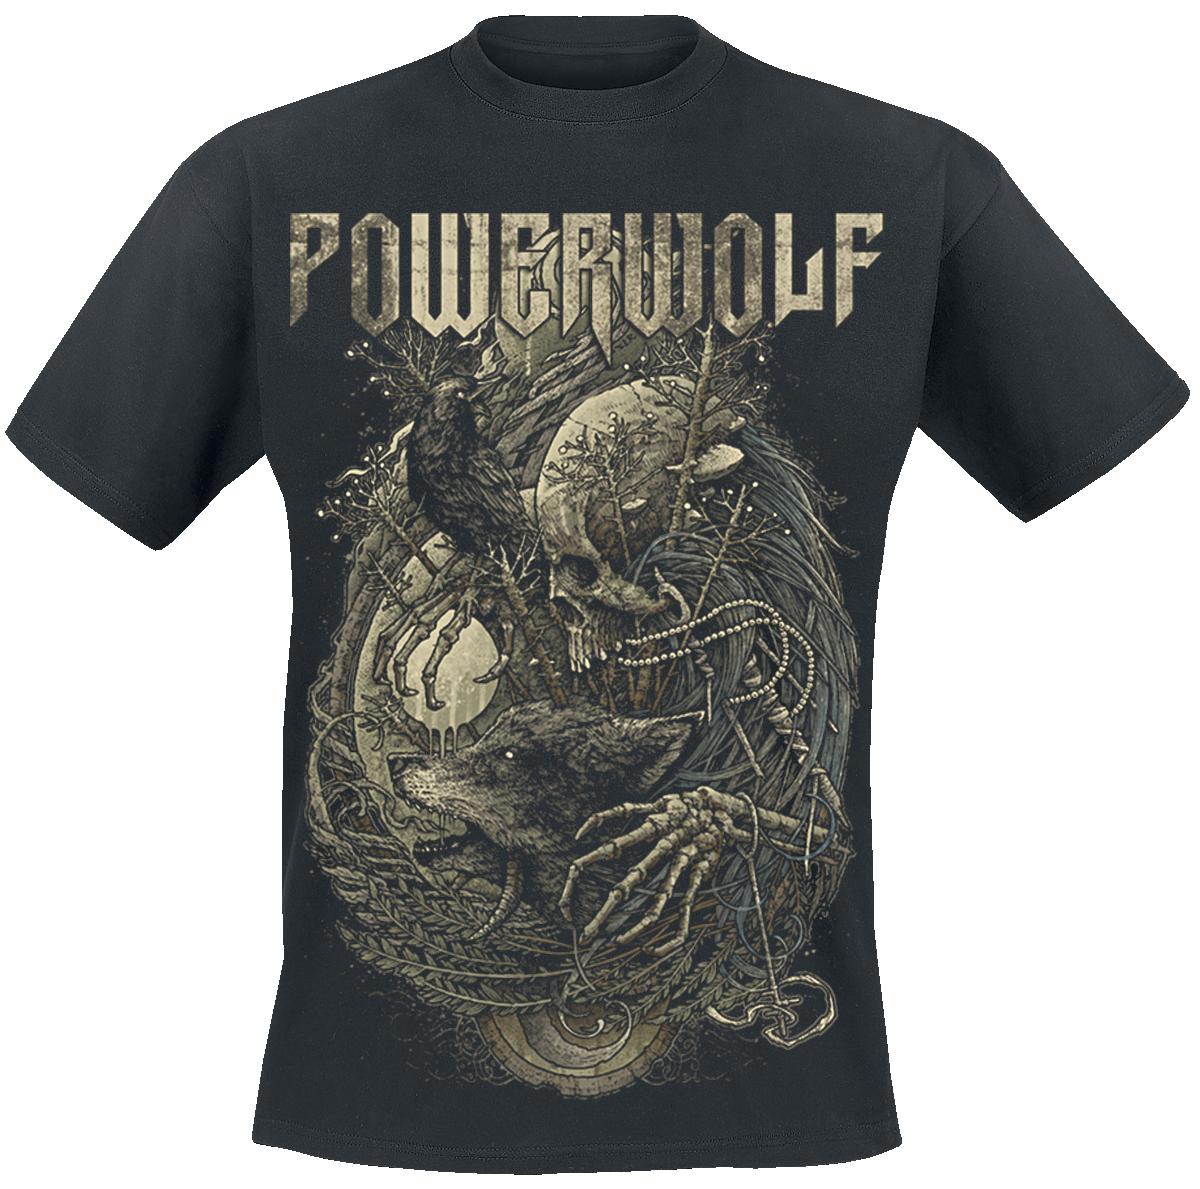 Powerwolf - In Blood We Trust - T-Shirt - black image